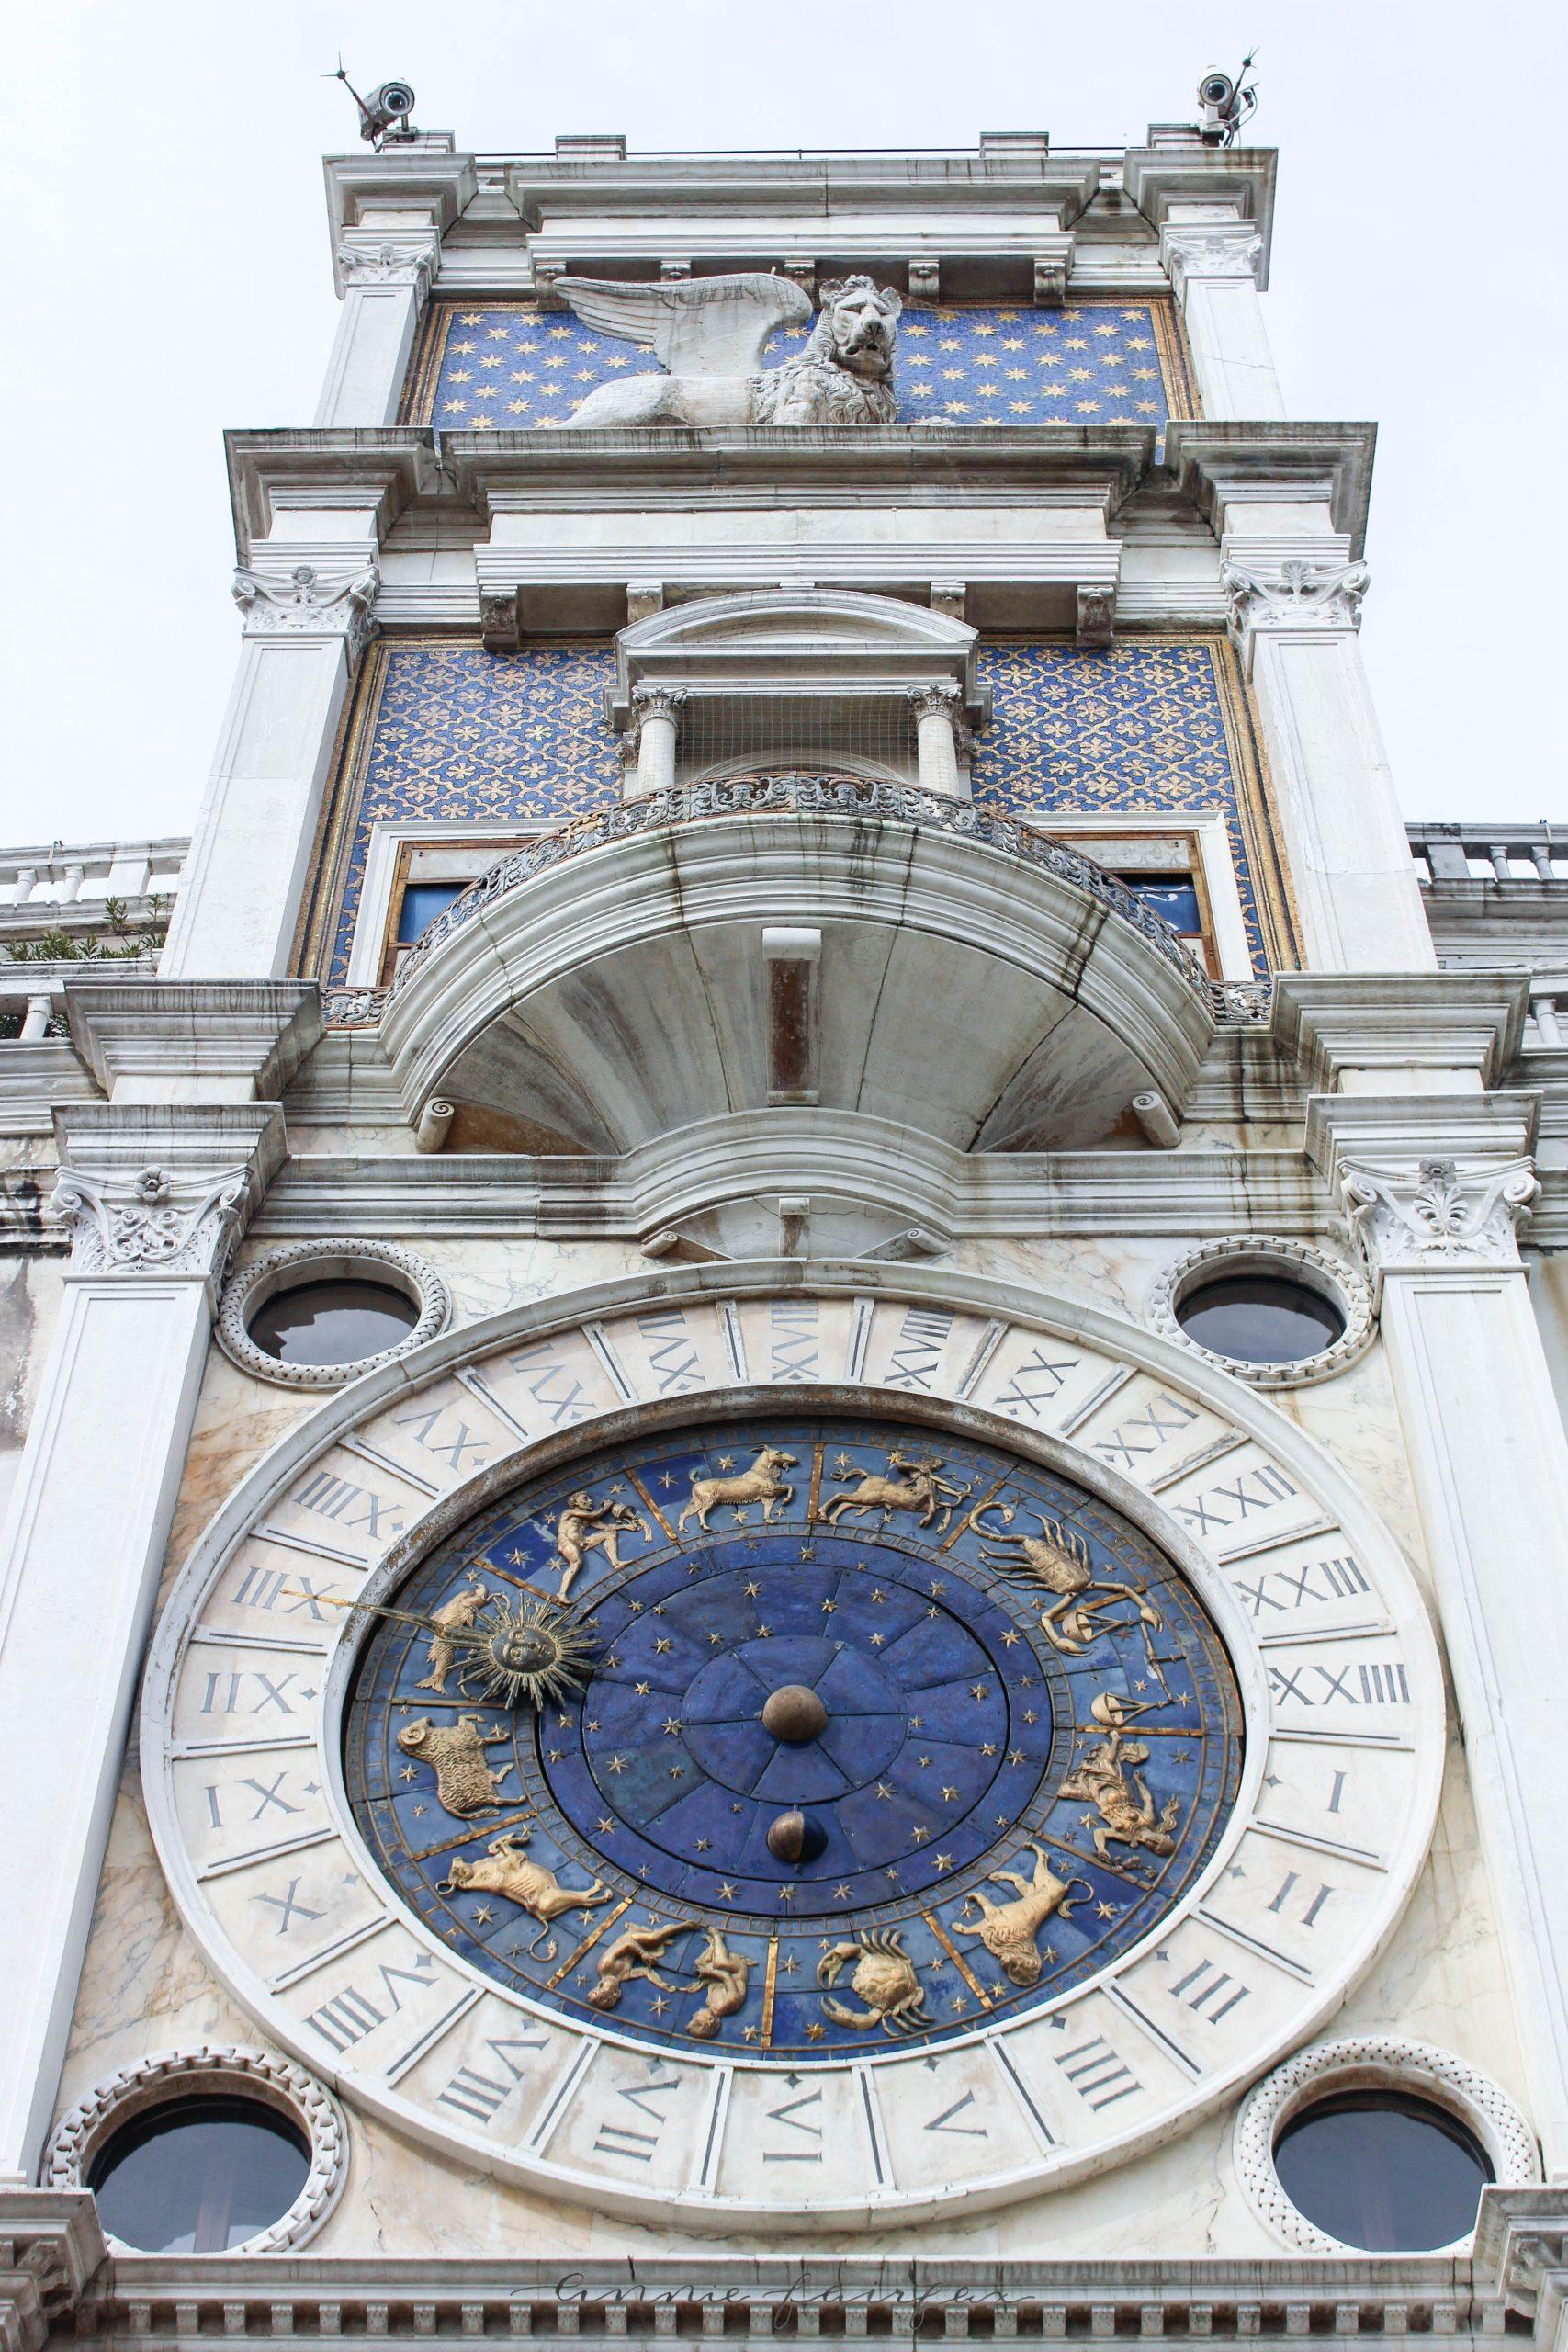 Saint Mark's Clocktower Lapis Lazuli Zodiac Clock Saint Mark's Basilica Venice Italy Catholic Church Opulent Gold San Marco Saint Mark's Basilica & Saint Mark's Square Best Things to See and Do in Venice, Italy by Annie Fairfax Luxury Travel